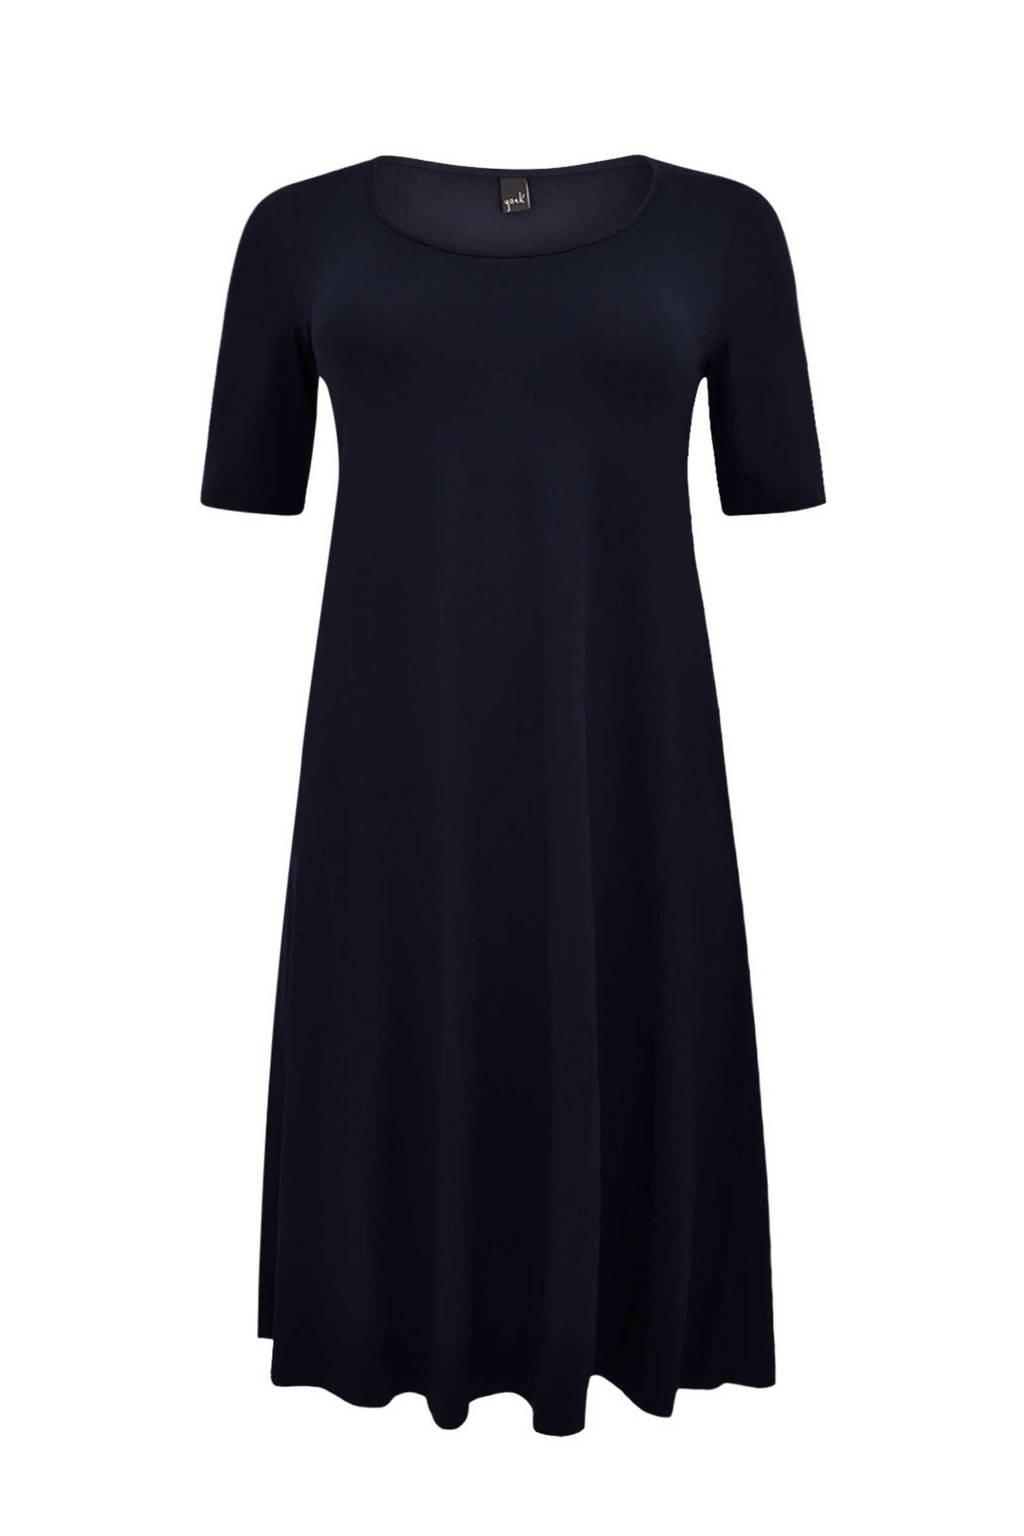 Yoek jurk met plooien donkerblauw, Donkerblauw